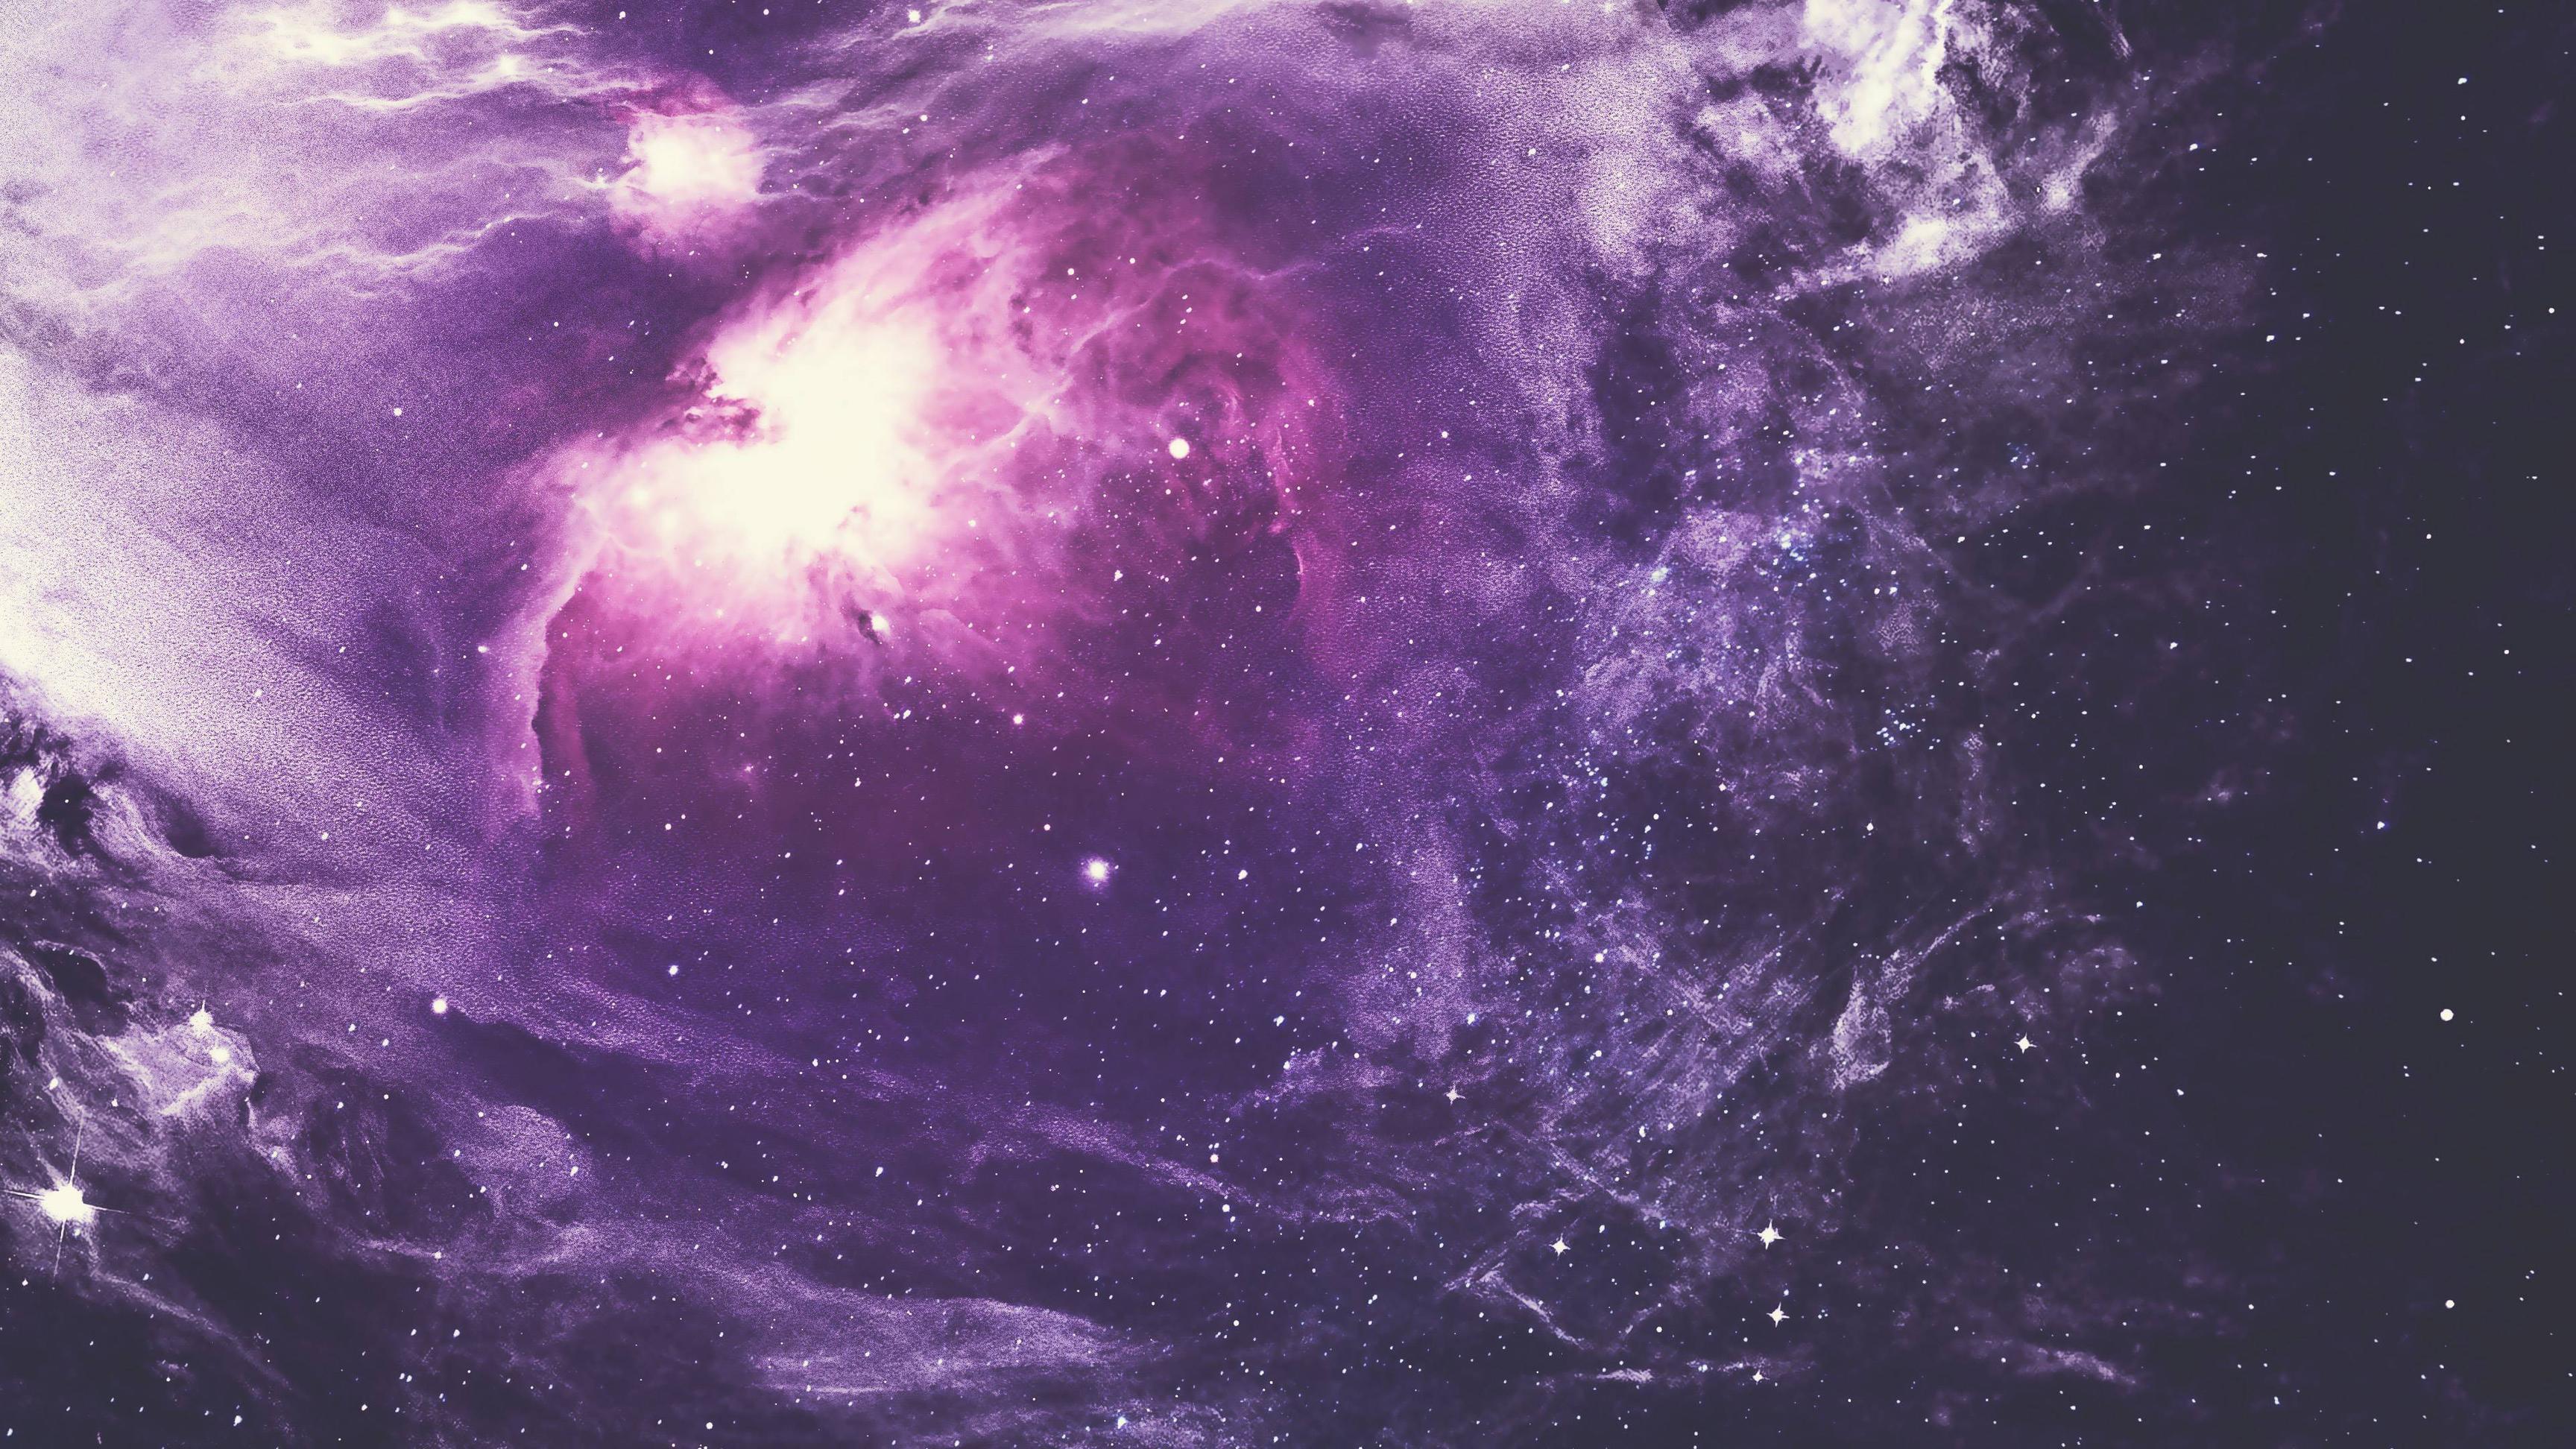 4k purple aesthetic wallpapers